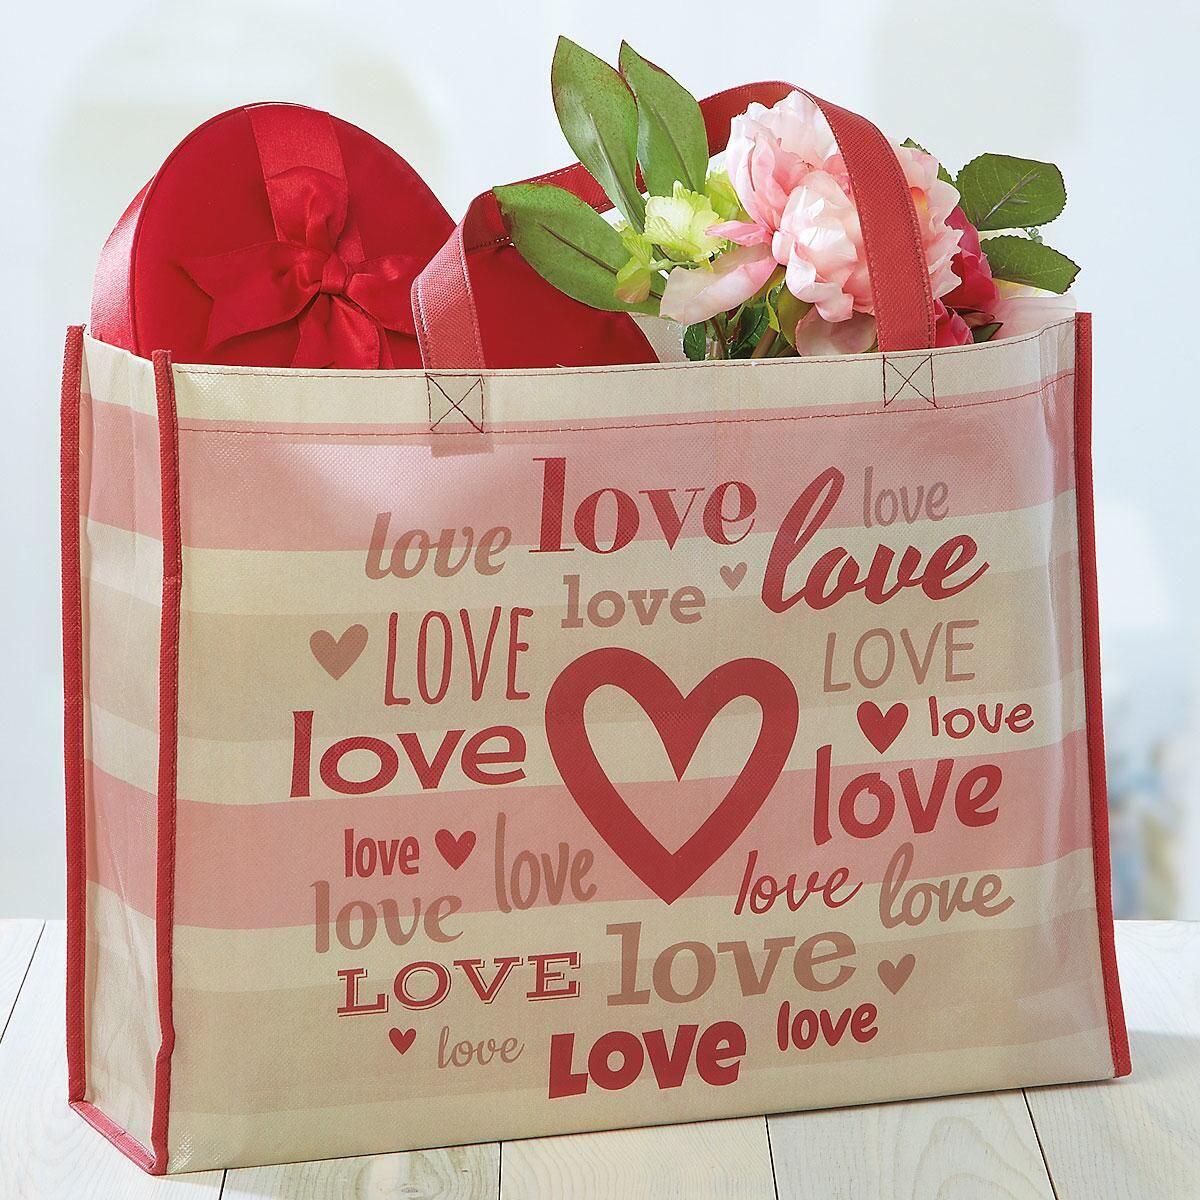 Love Hearts Tote Buy 1 Get 1 Free!